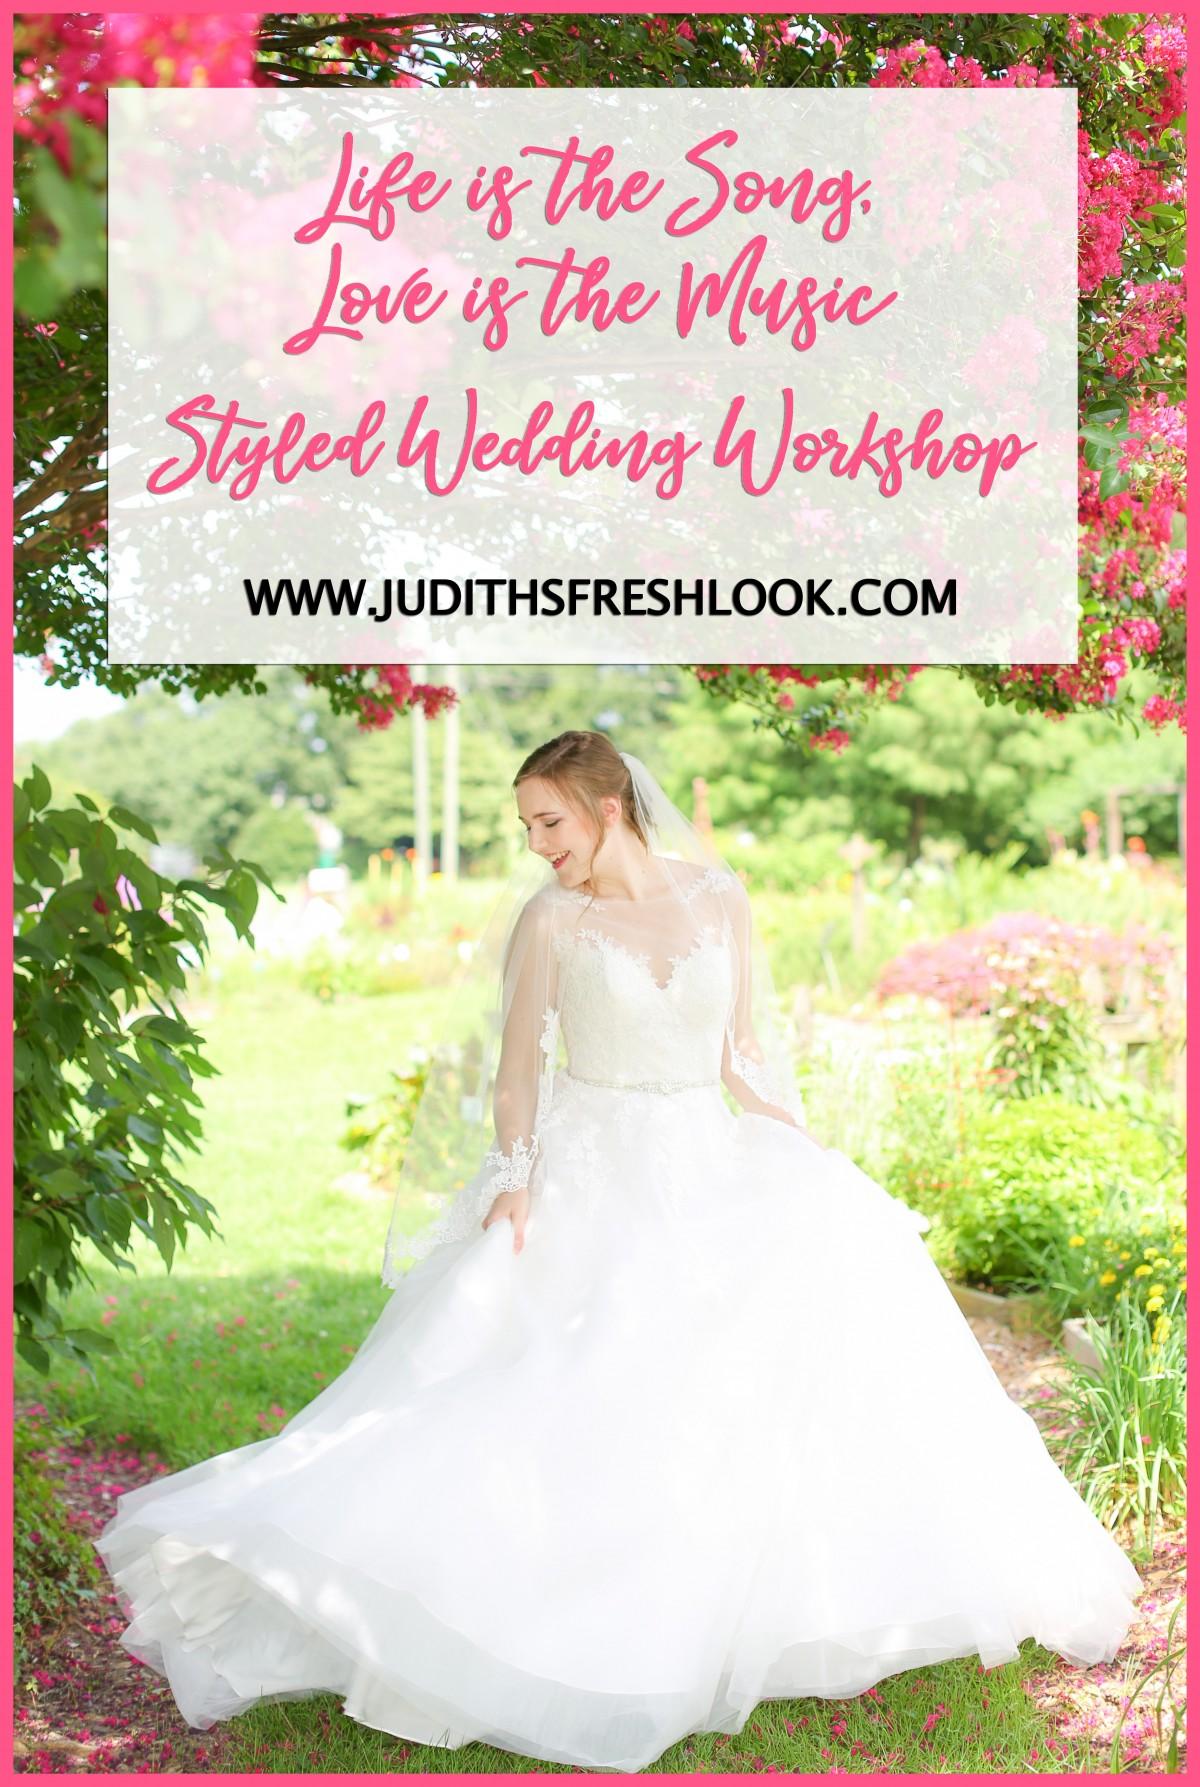 Styled Wedding Workshop in Chesapeake, VA